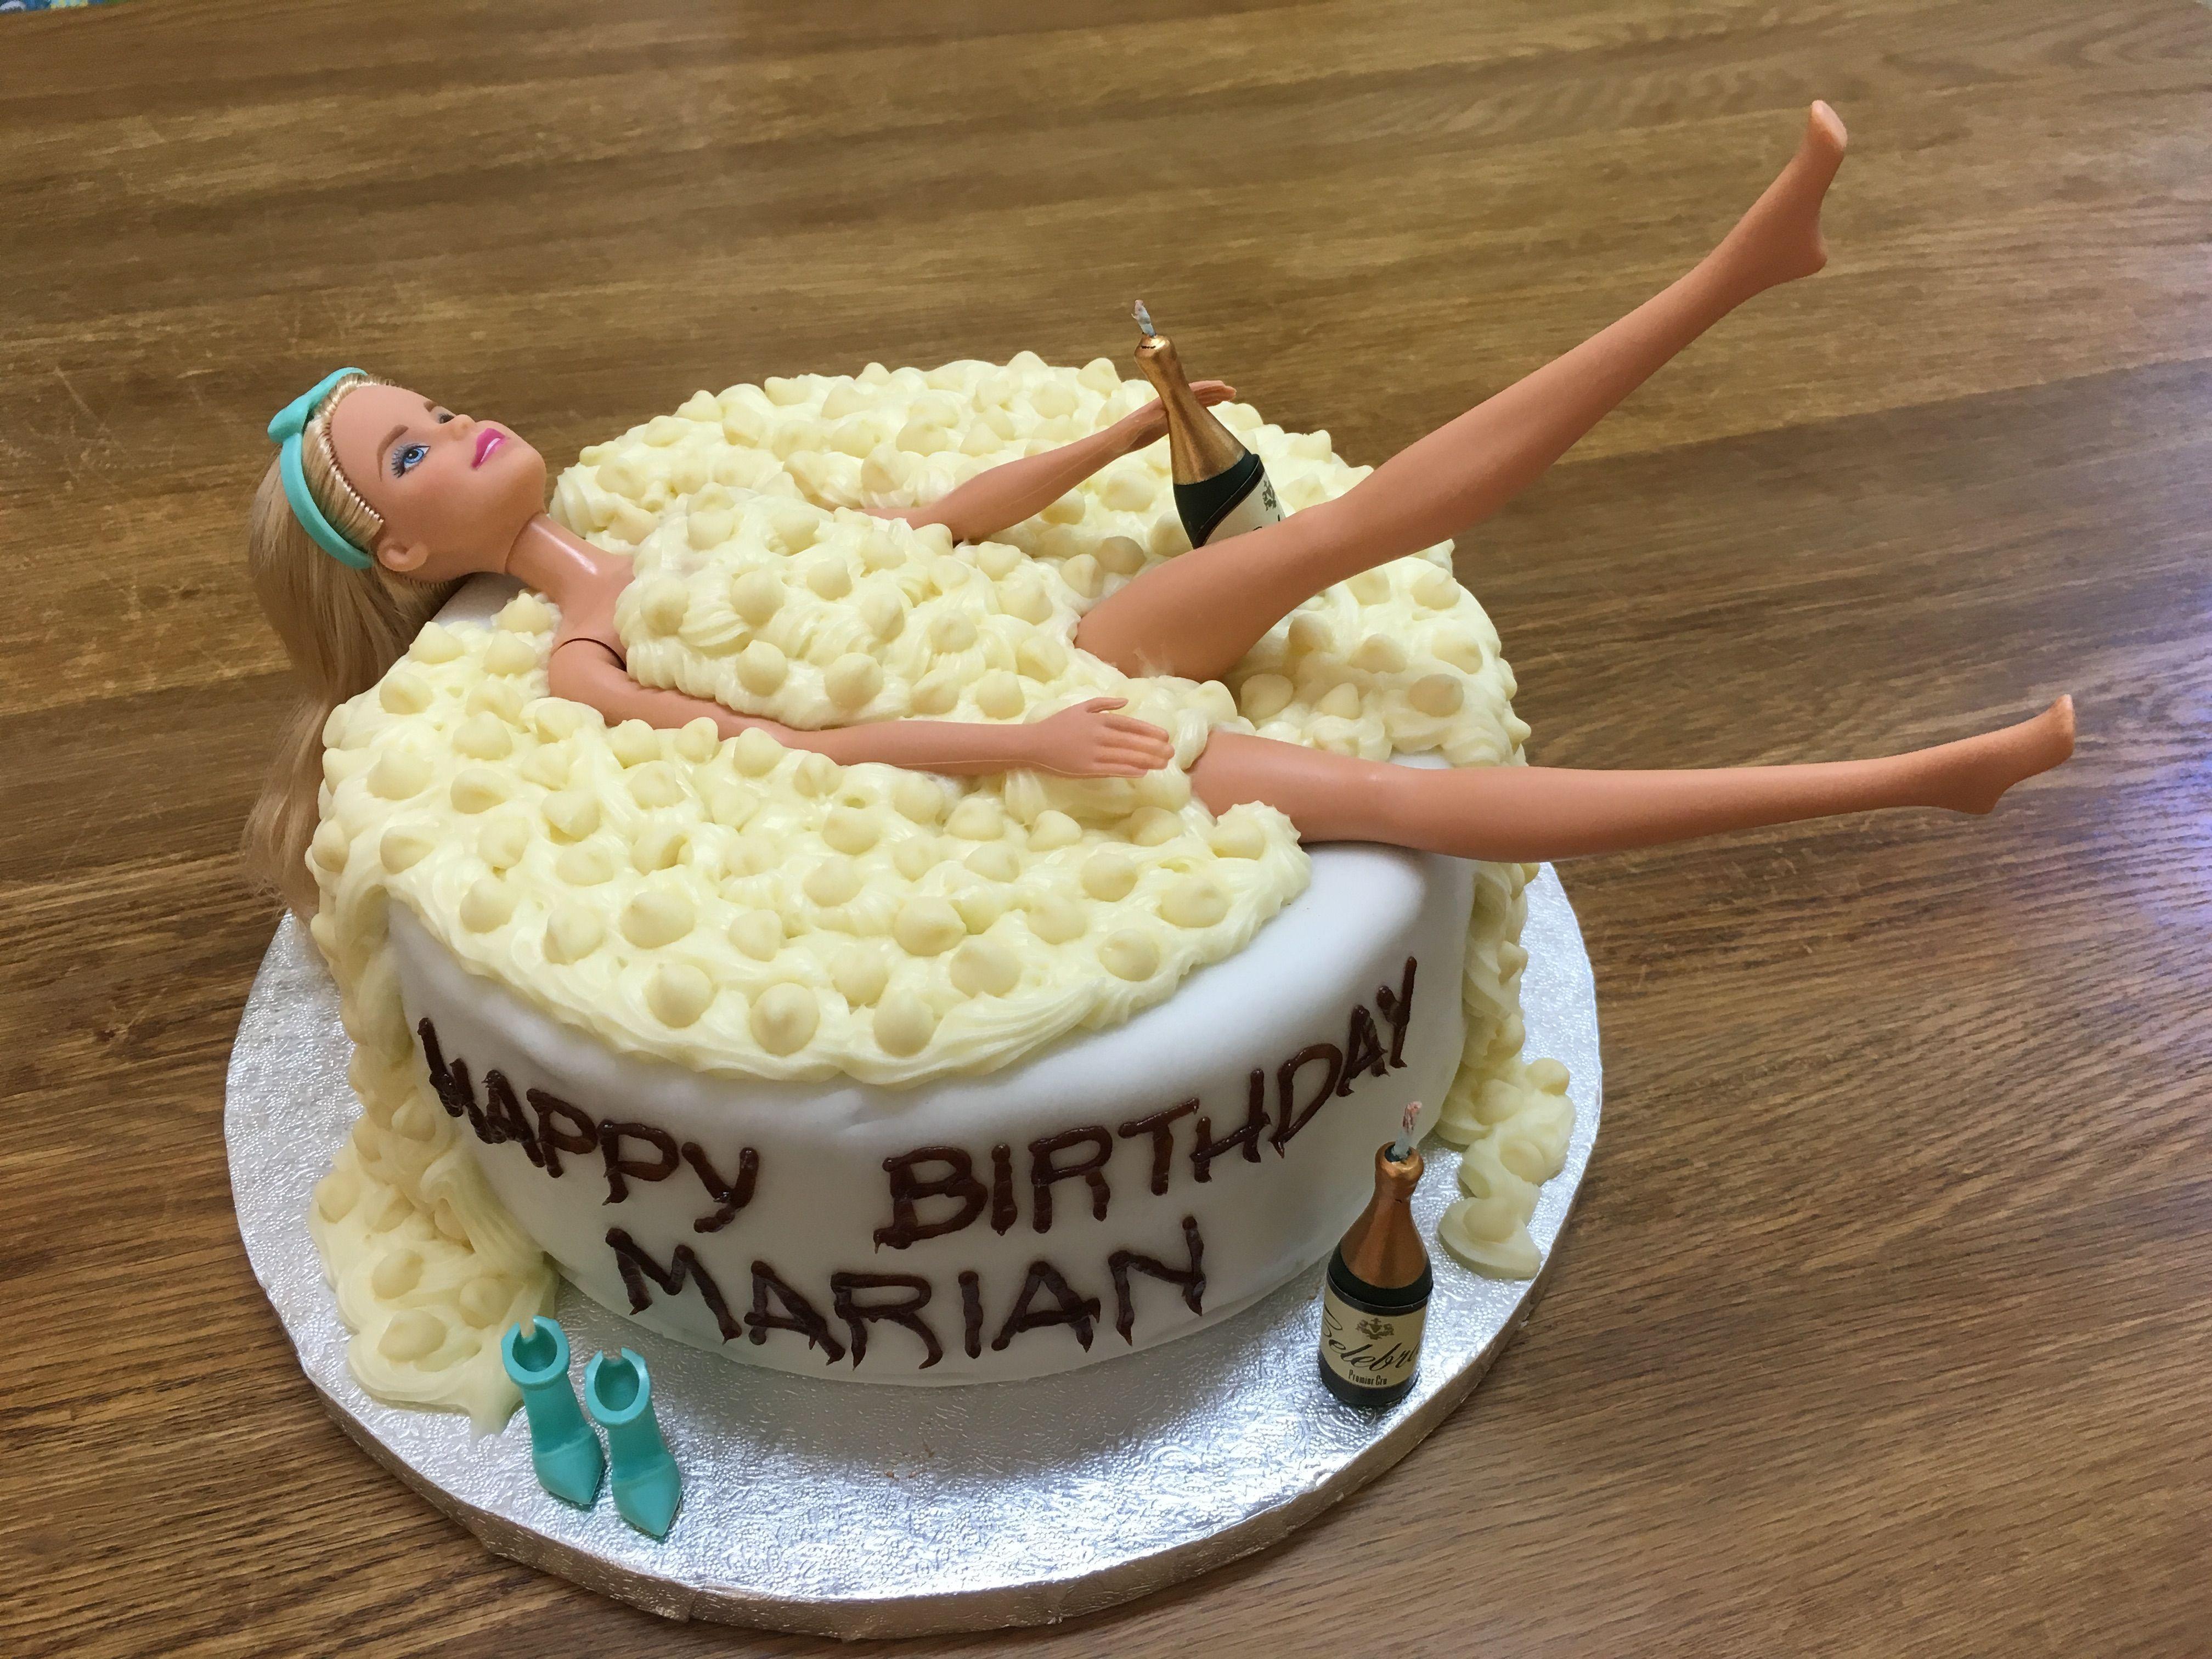 Barbie in the bathtub wonderful cake for my friend Marian